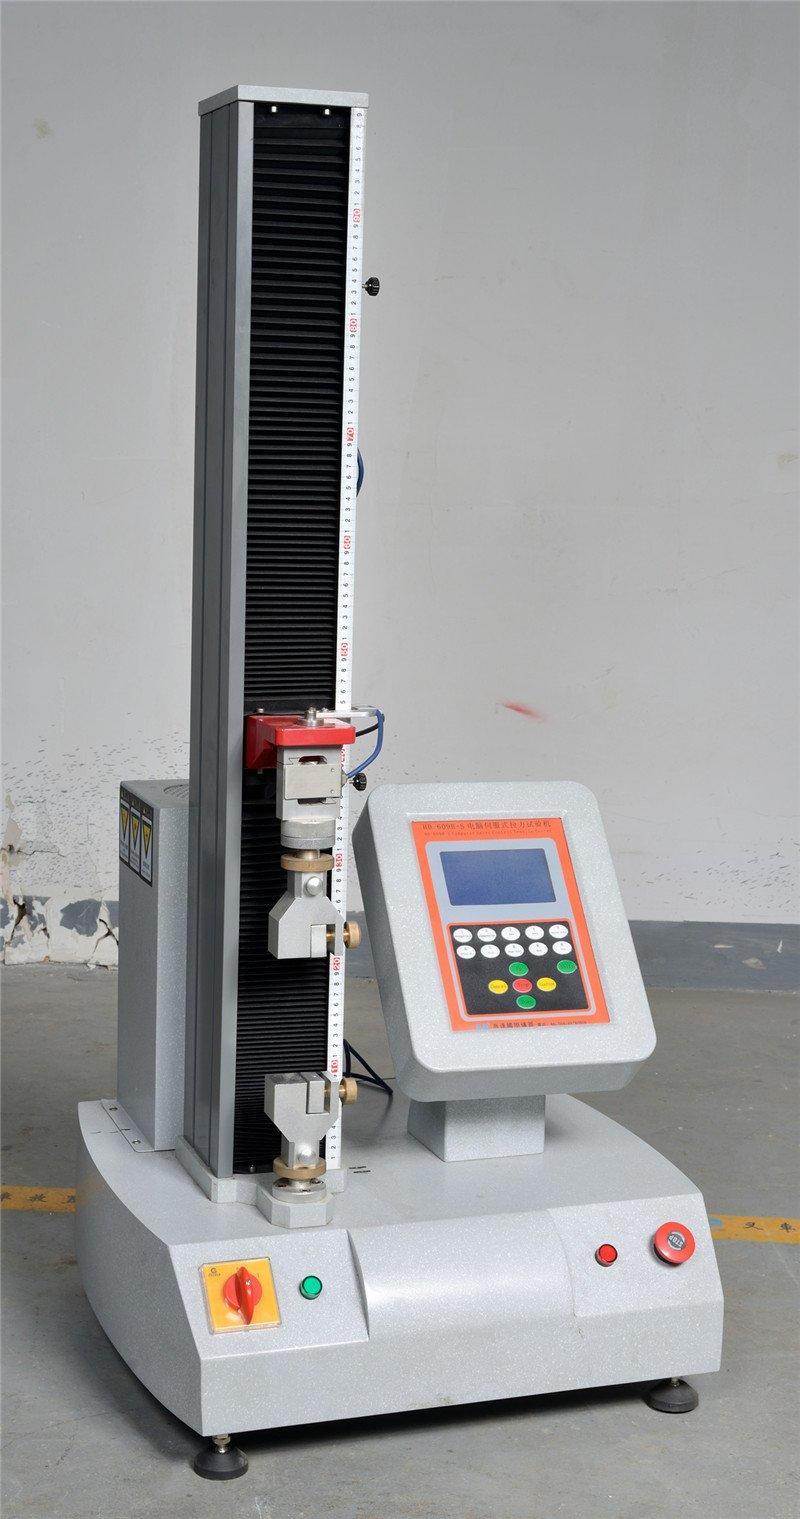 adhesive tape peel test equipment